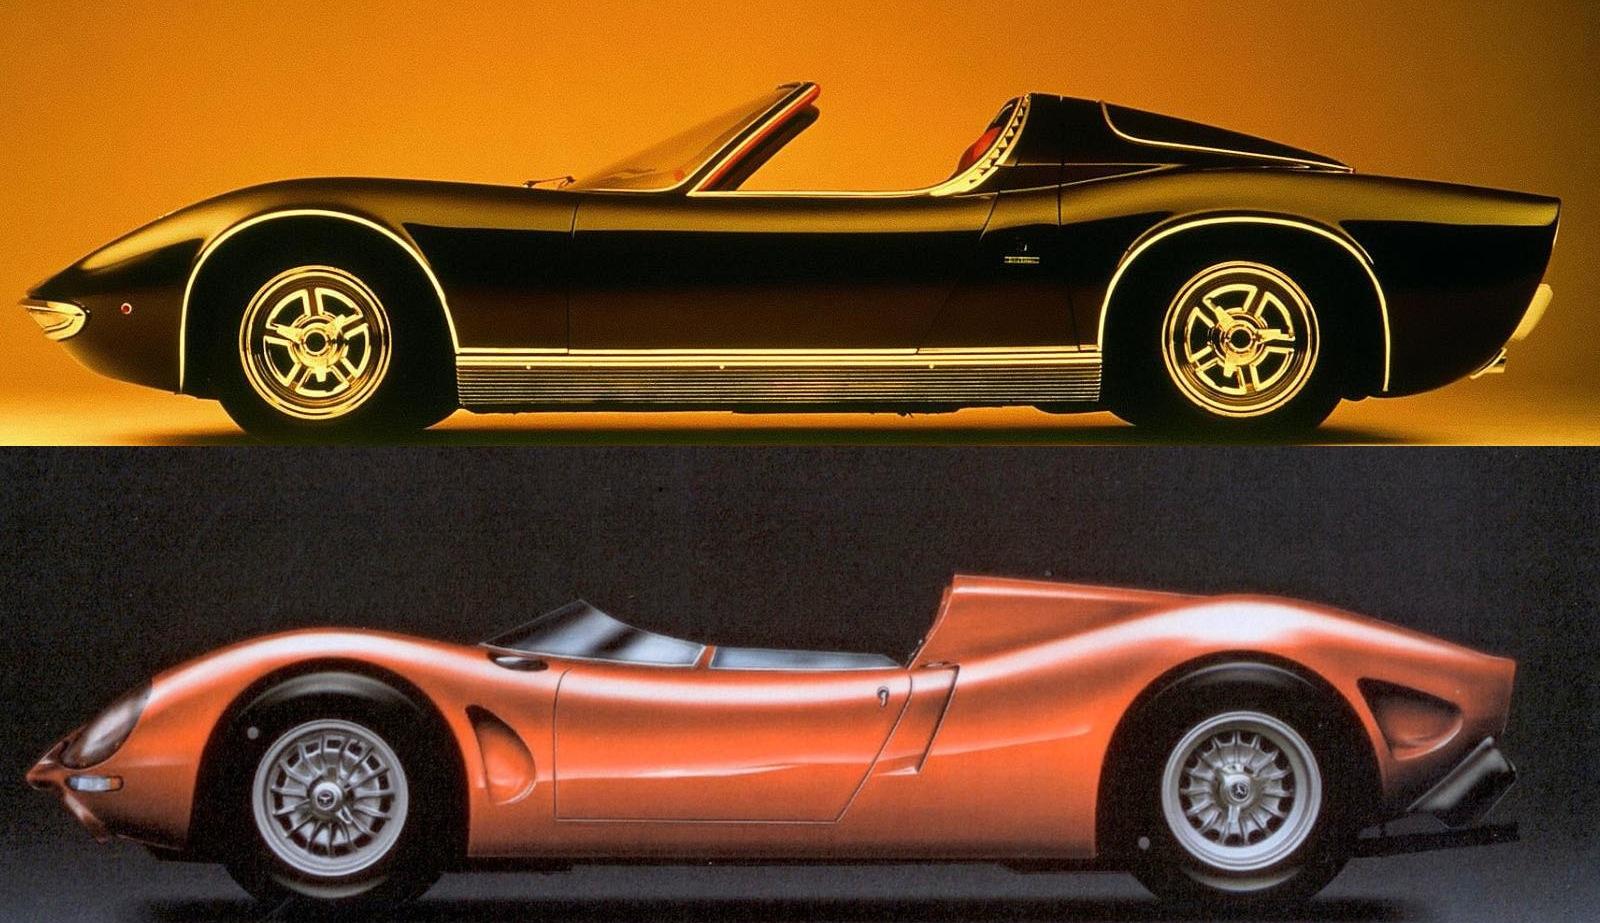 The Lamborghini Miura The Facts And The Question Again